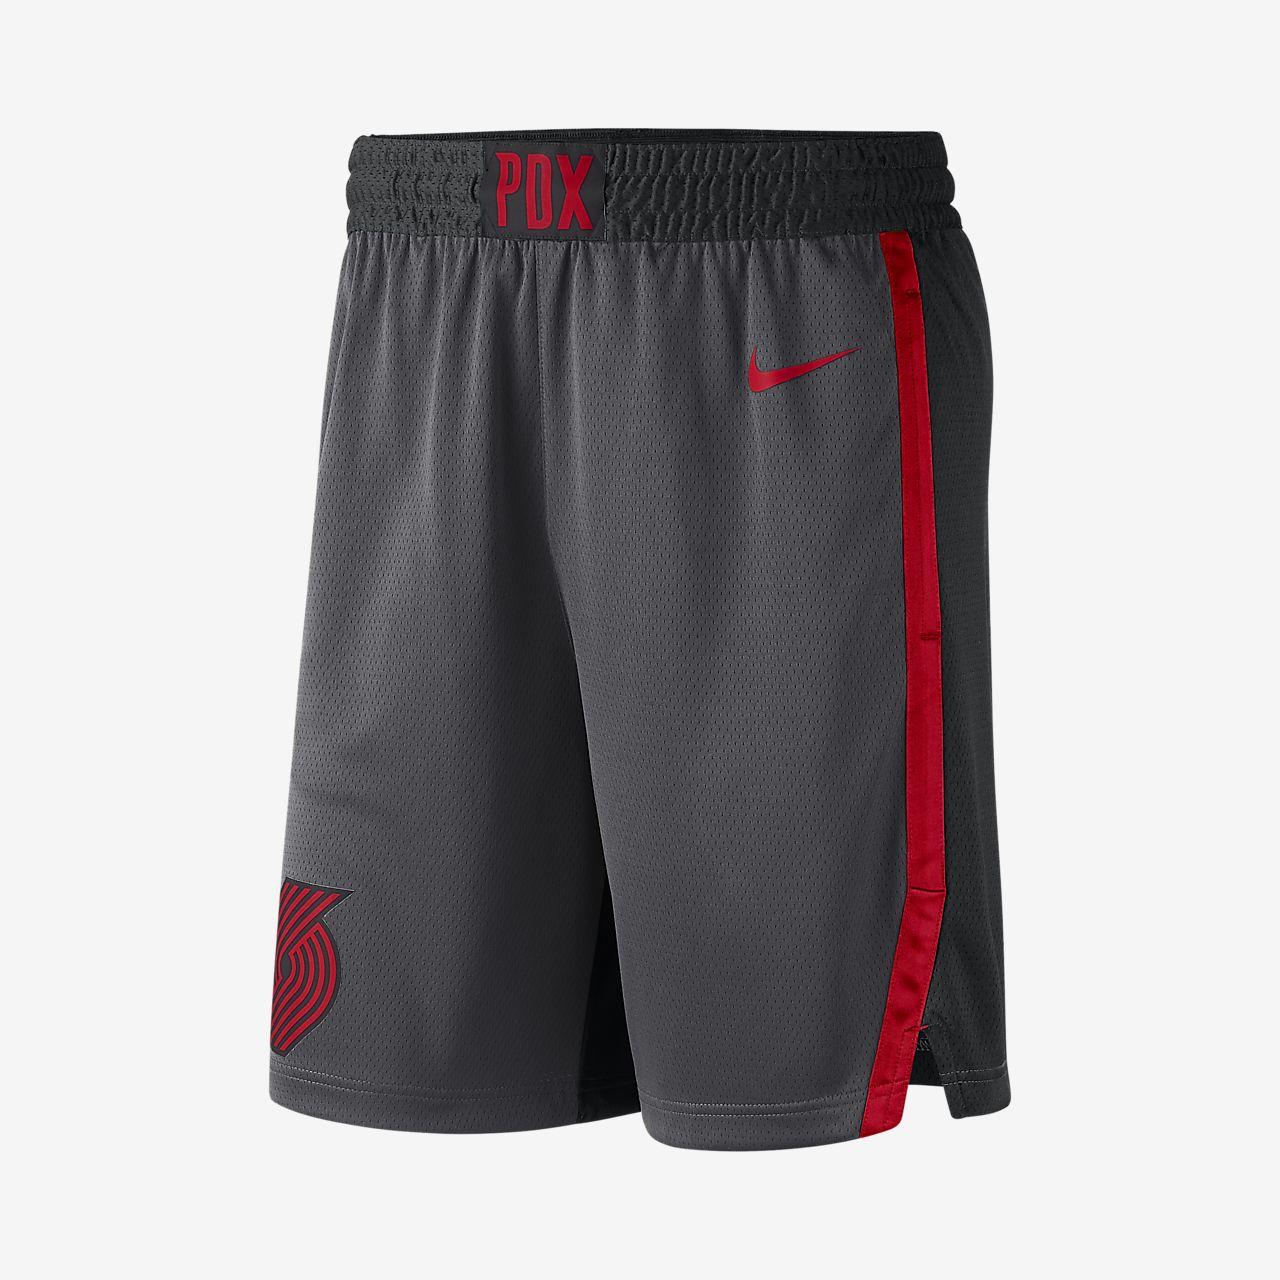 c92f6b7cf2e0 Portland Trail Blazers City Edition Swingman Men s Nike NBA Shorts ...